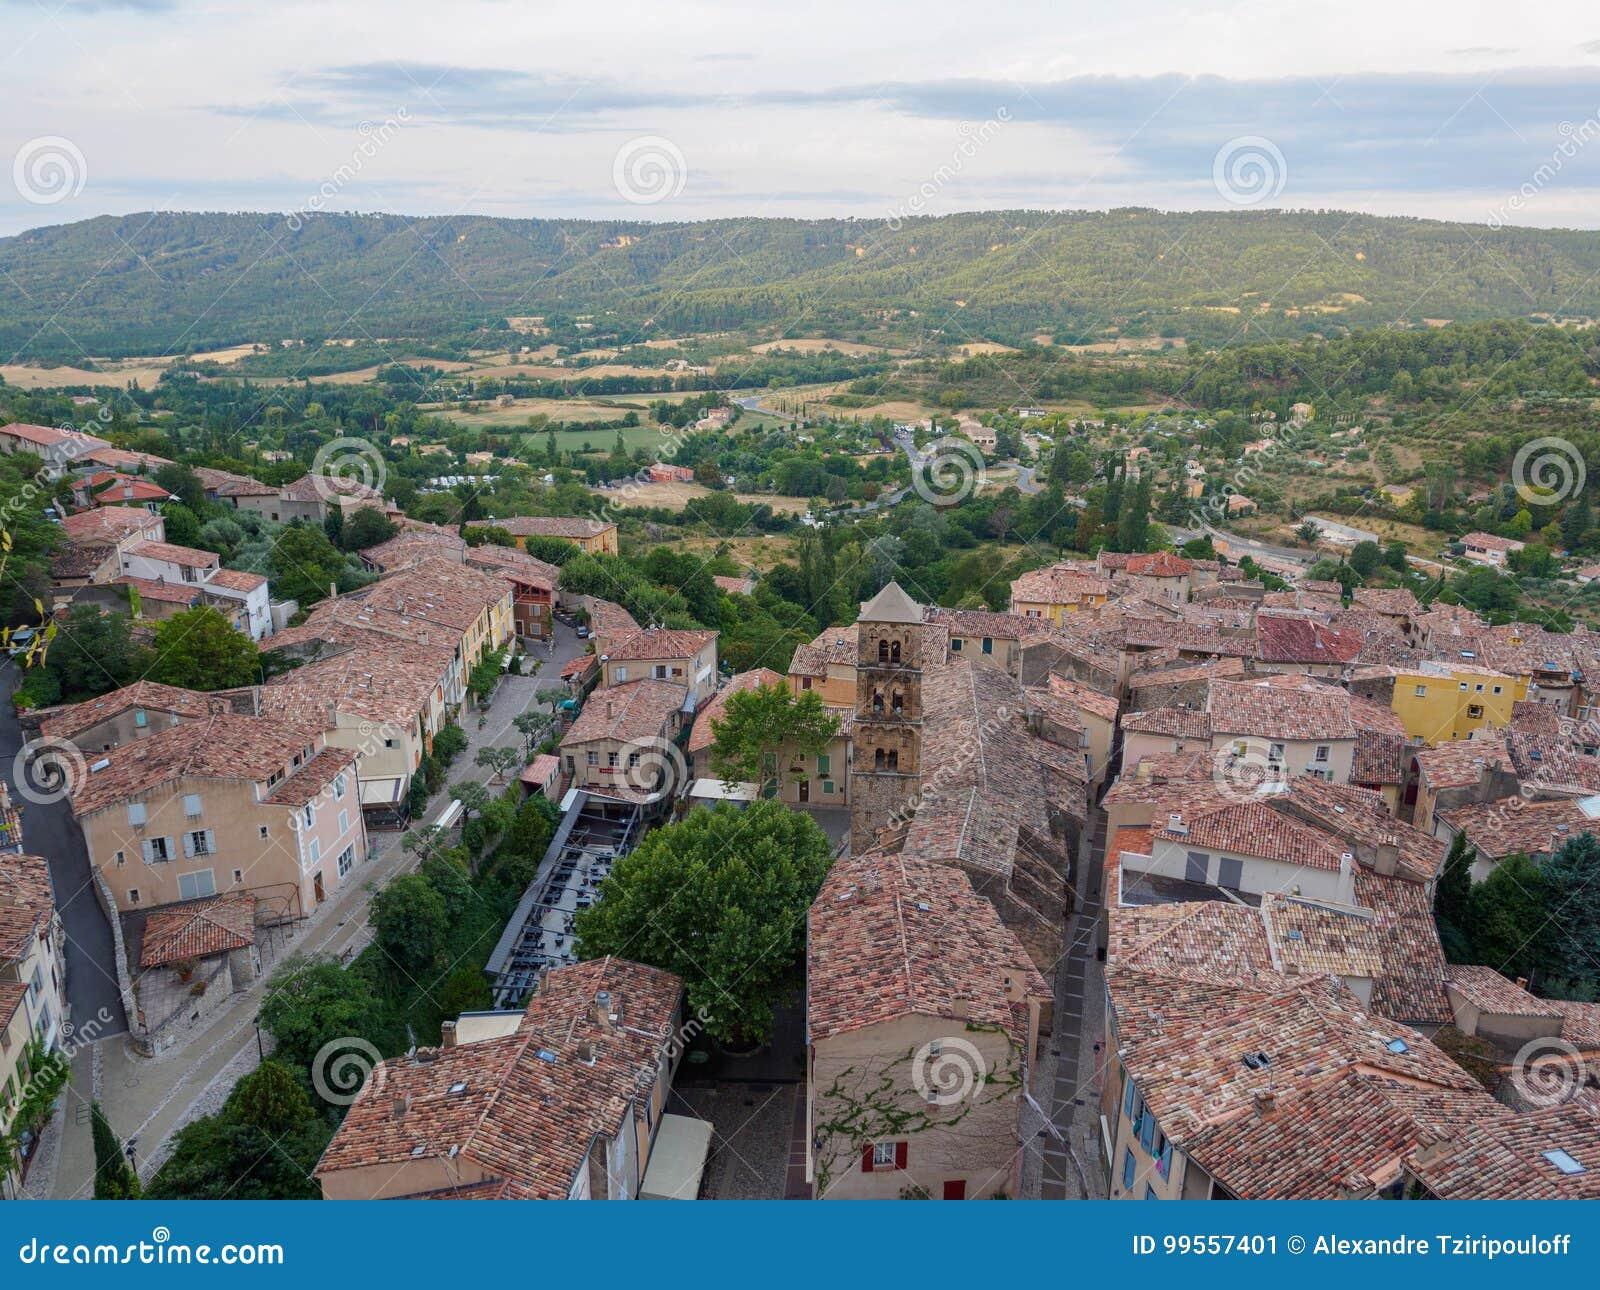 Aperçu de Moustiers-Sainte-Marie, France